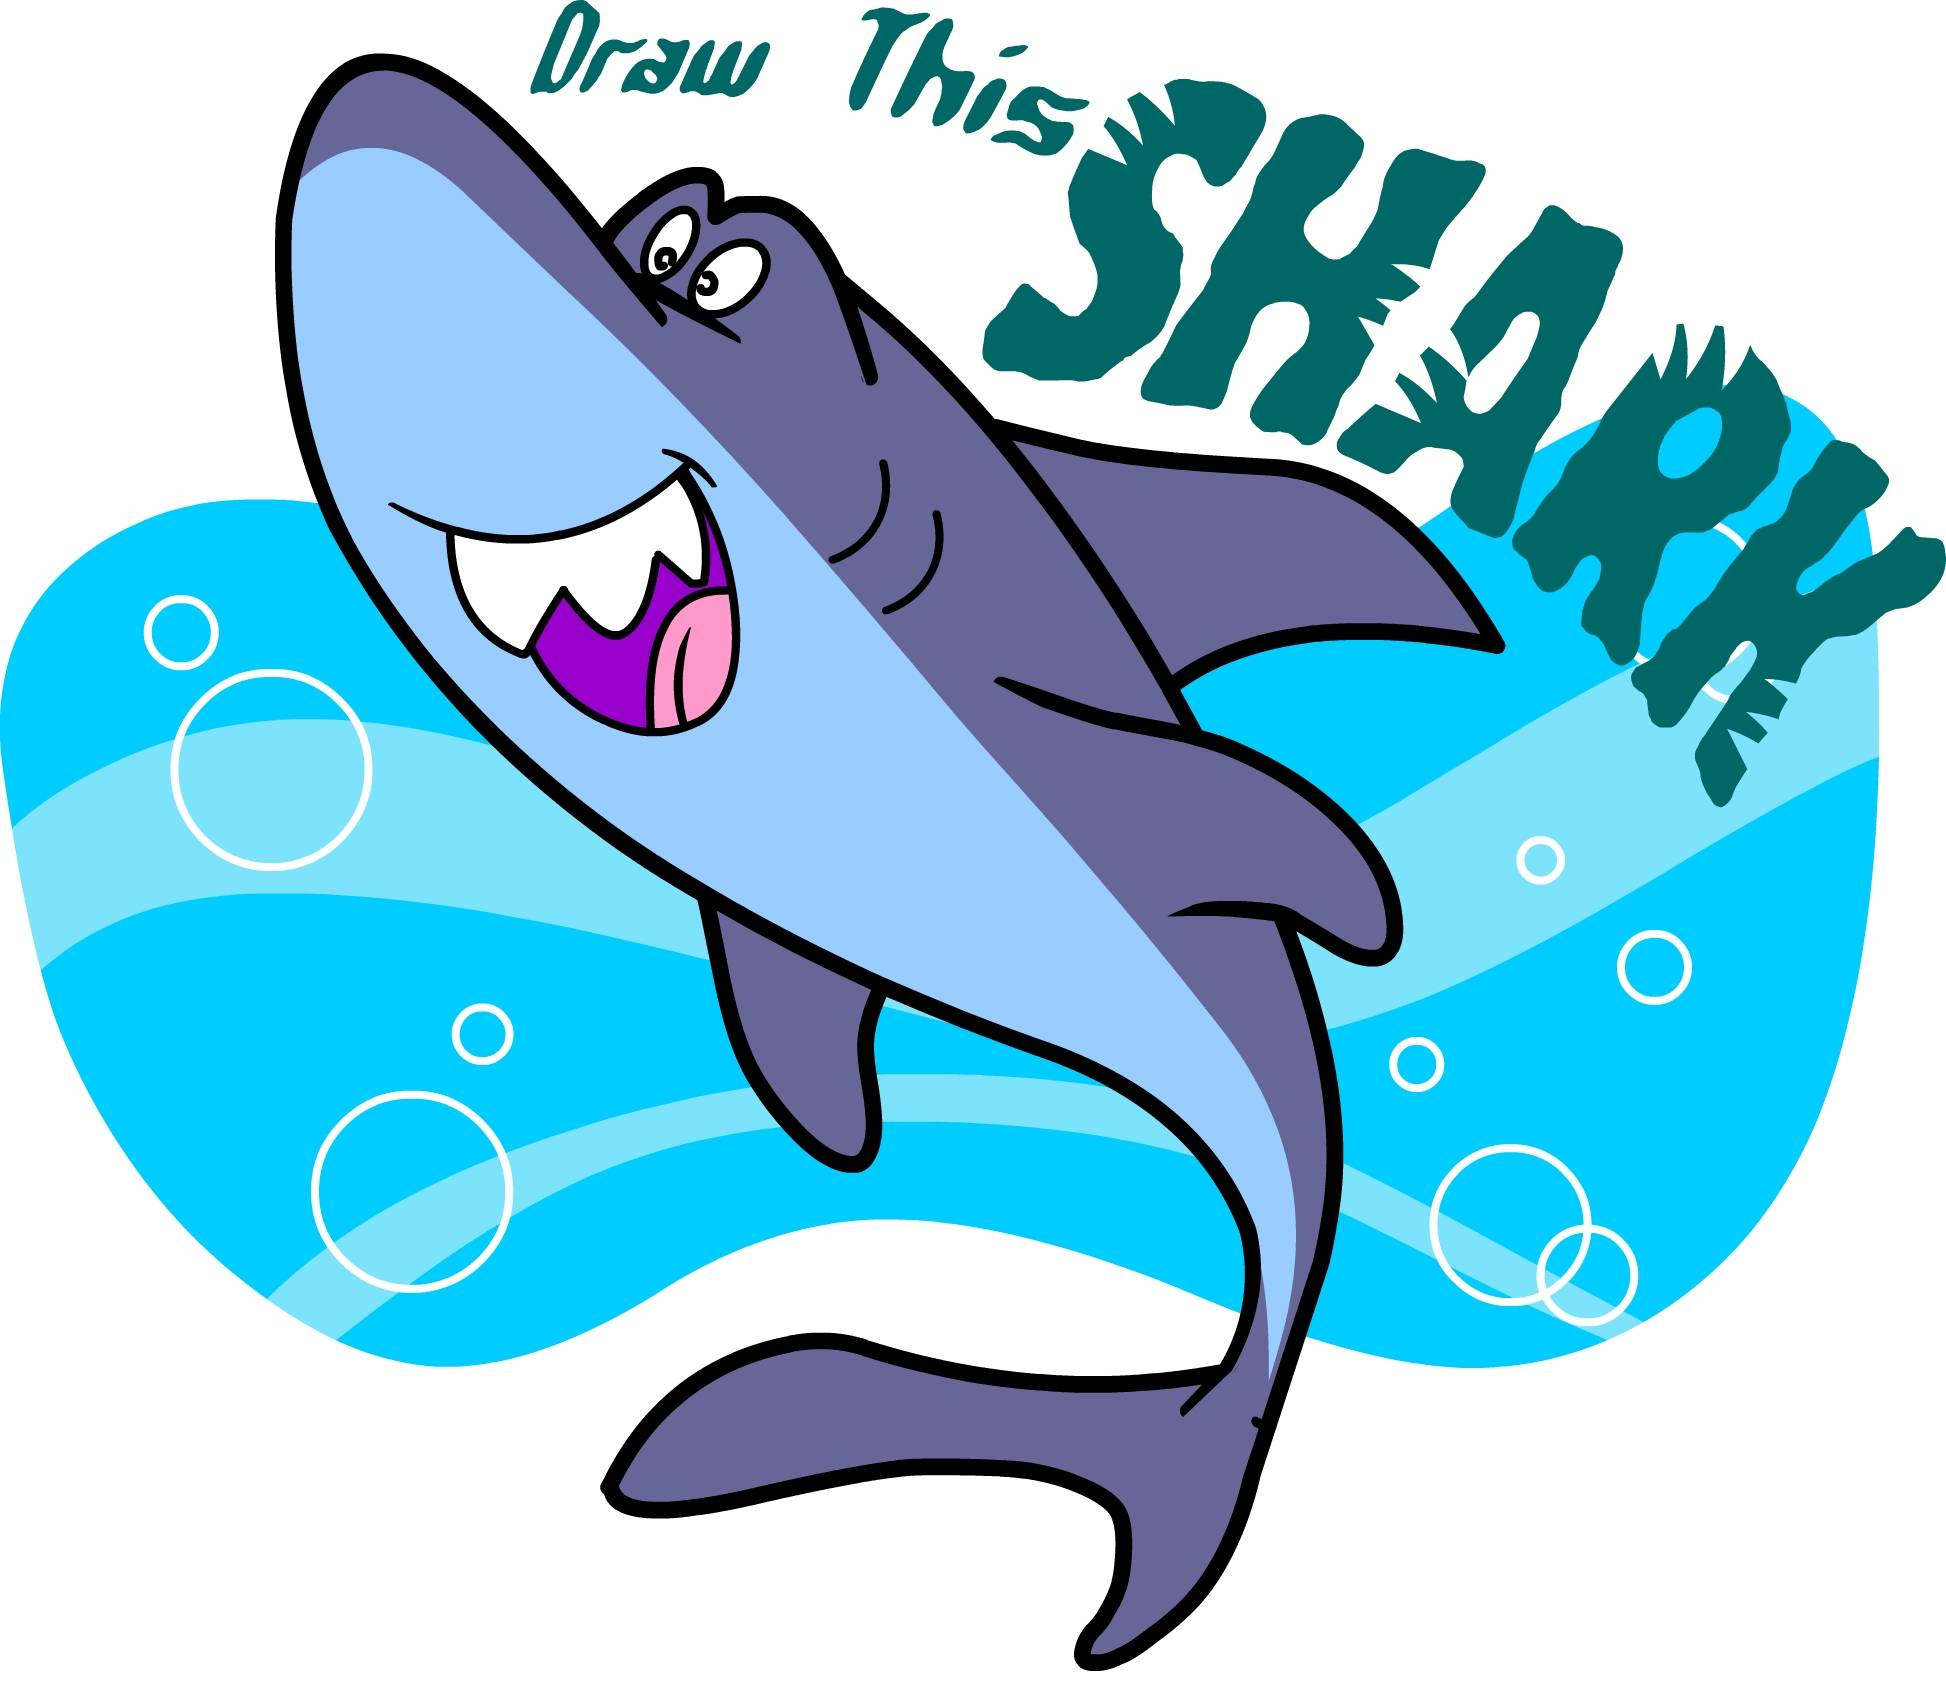 Fins clipart baby shark Free Shark Images Cartoon shark%20cartoon